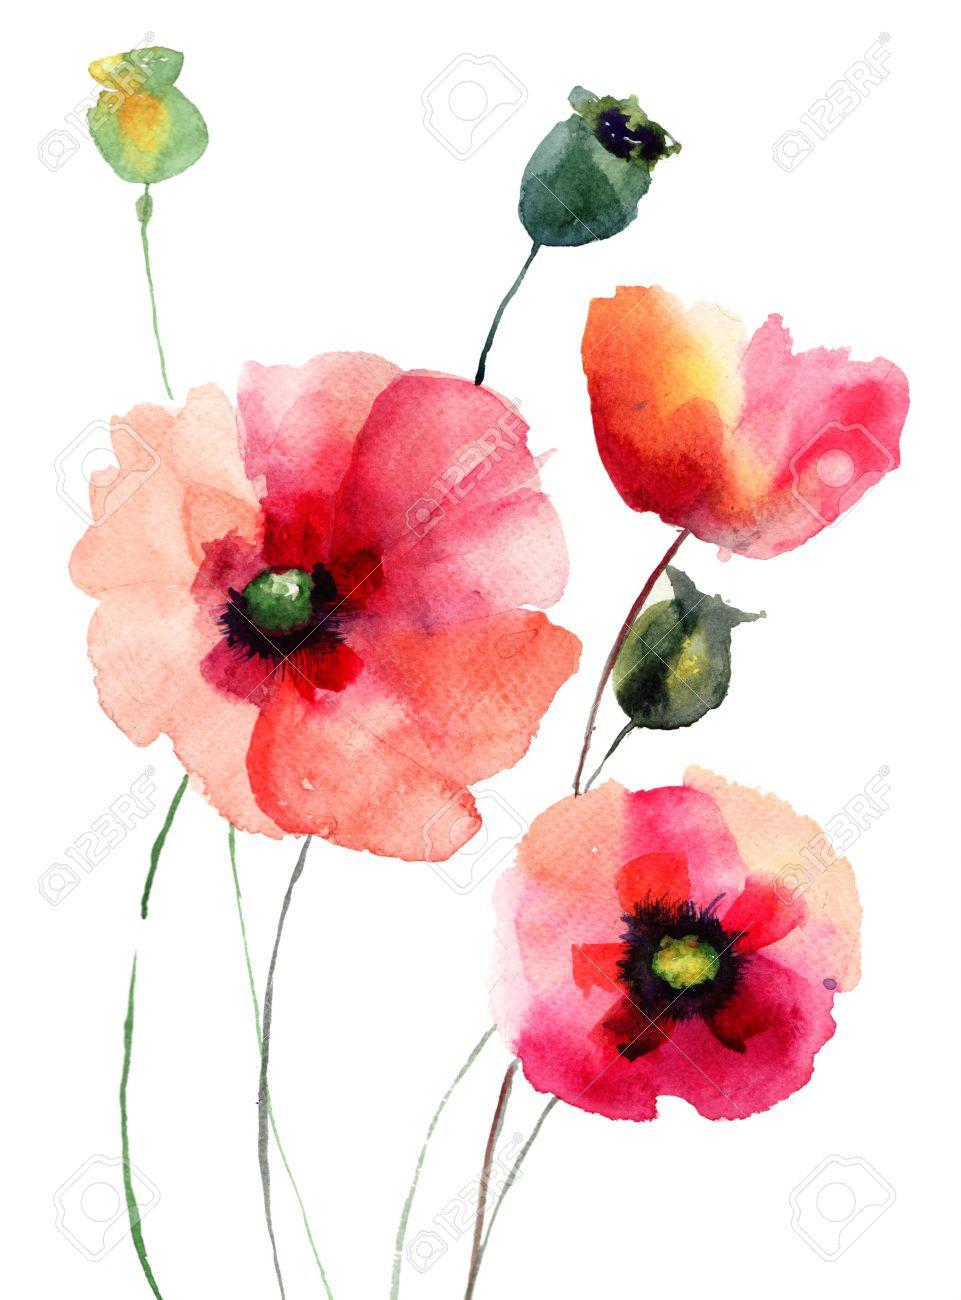 25978 poppy cliparts stock vector and royalty free poppy illustrations poppy flowers watercolor illustration mightylinksfo